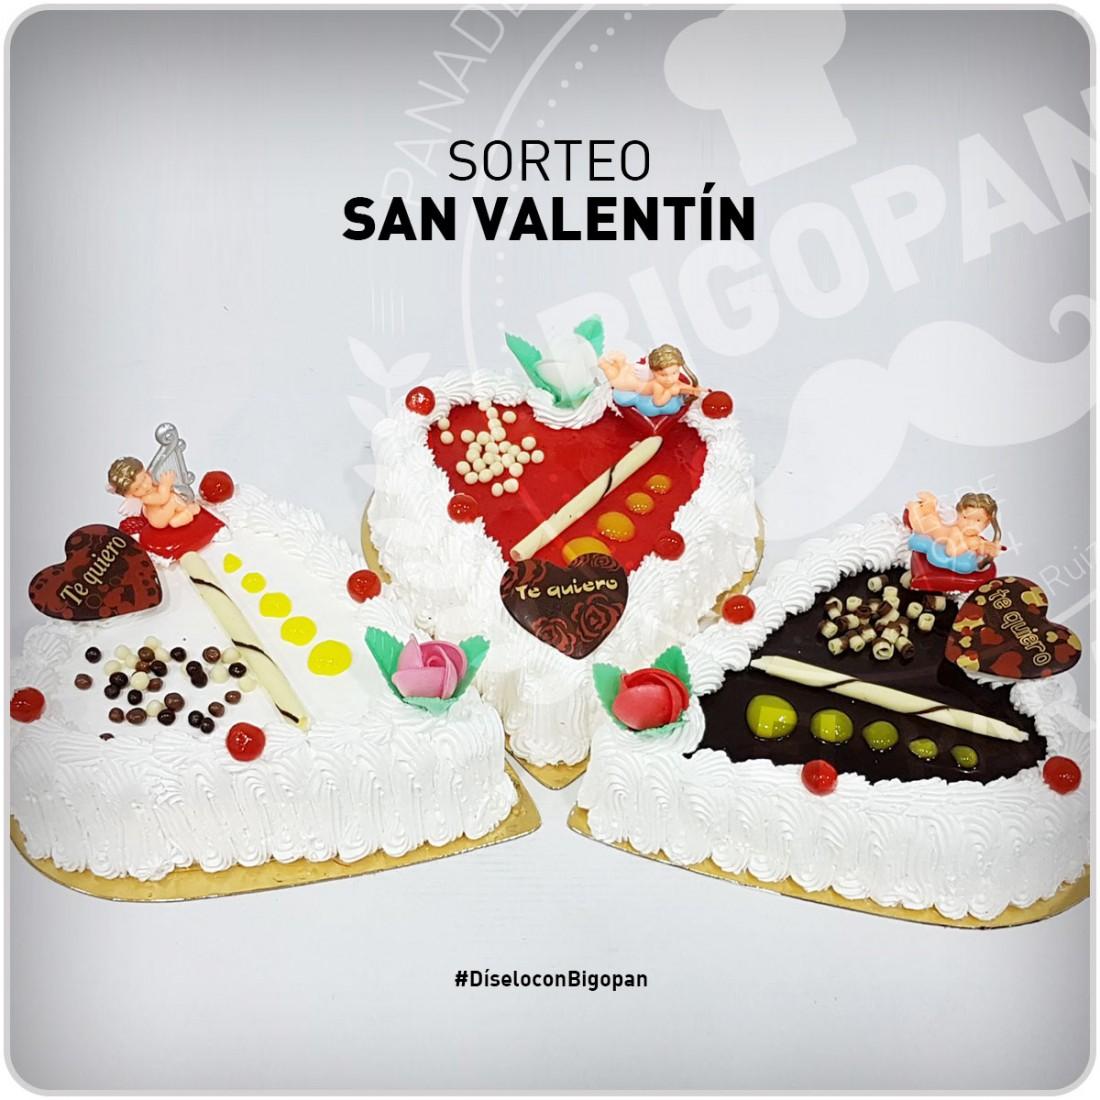 Sorteo-San-valentín-2018